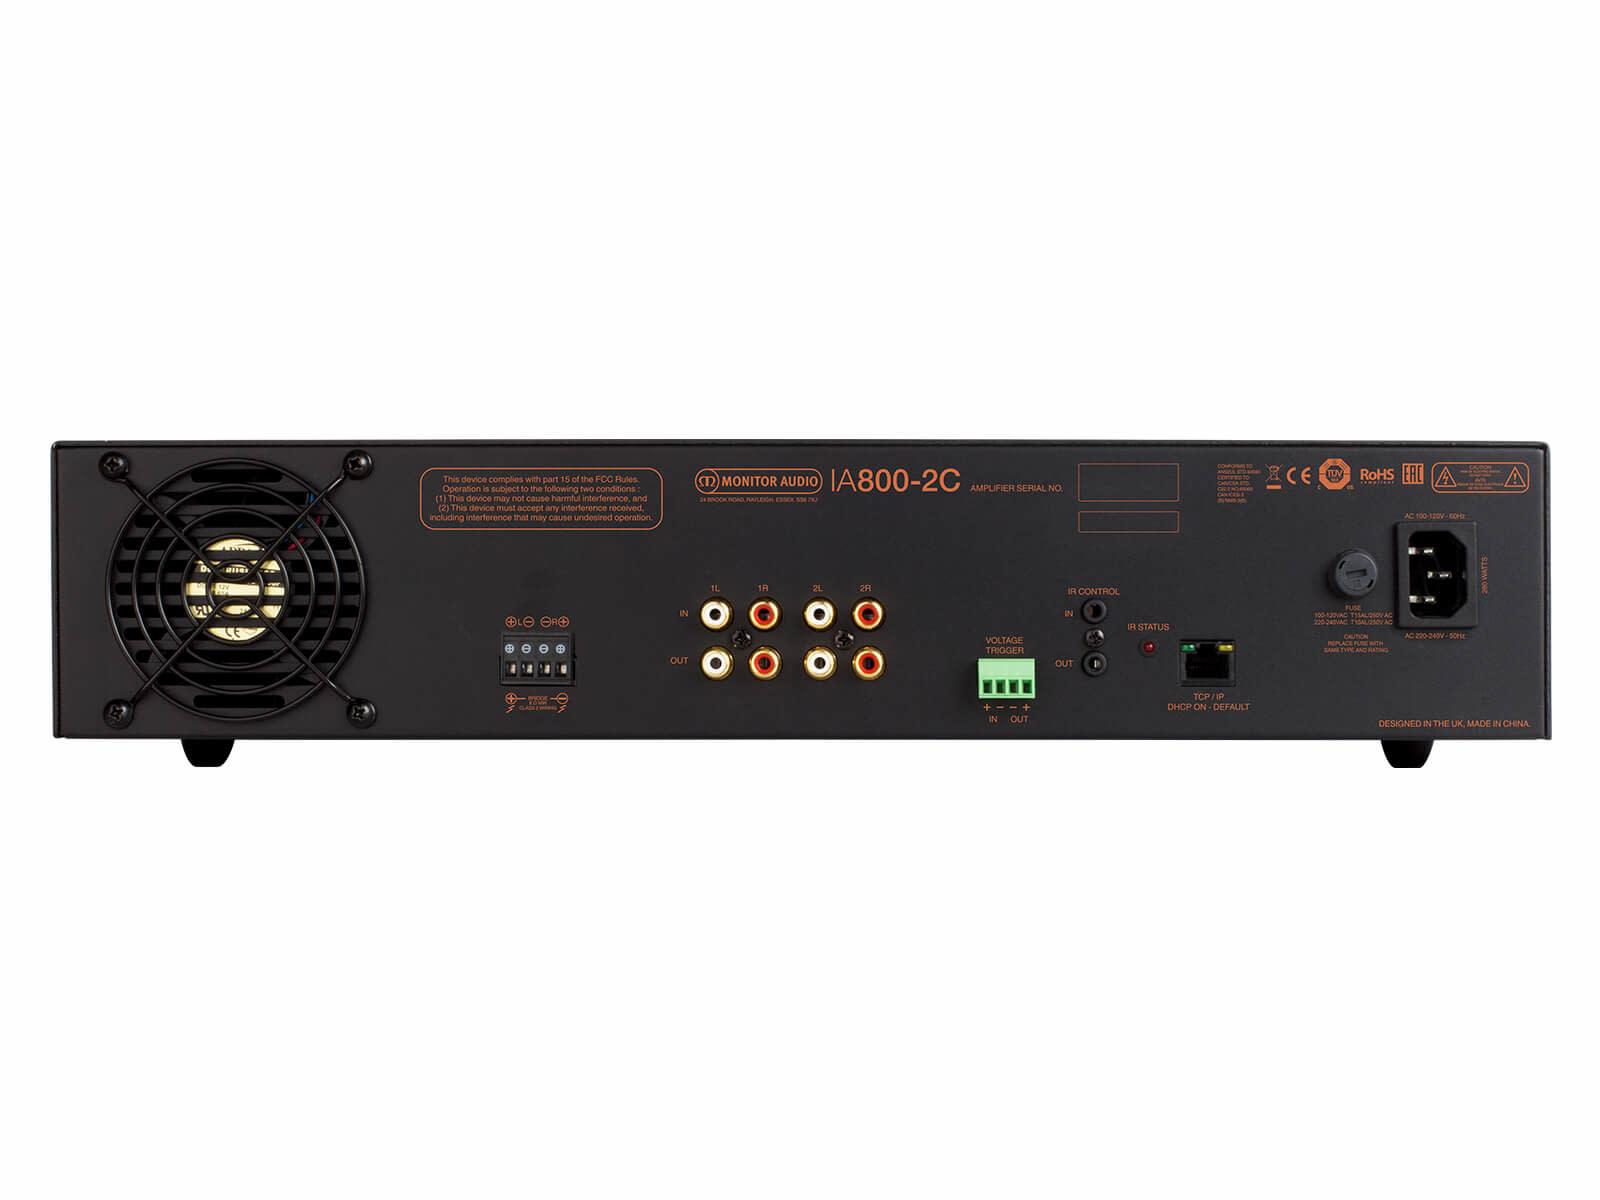 Monitor Audio IA800-2C Amplifier